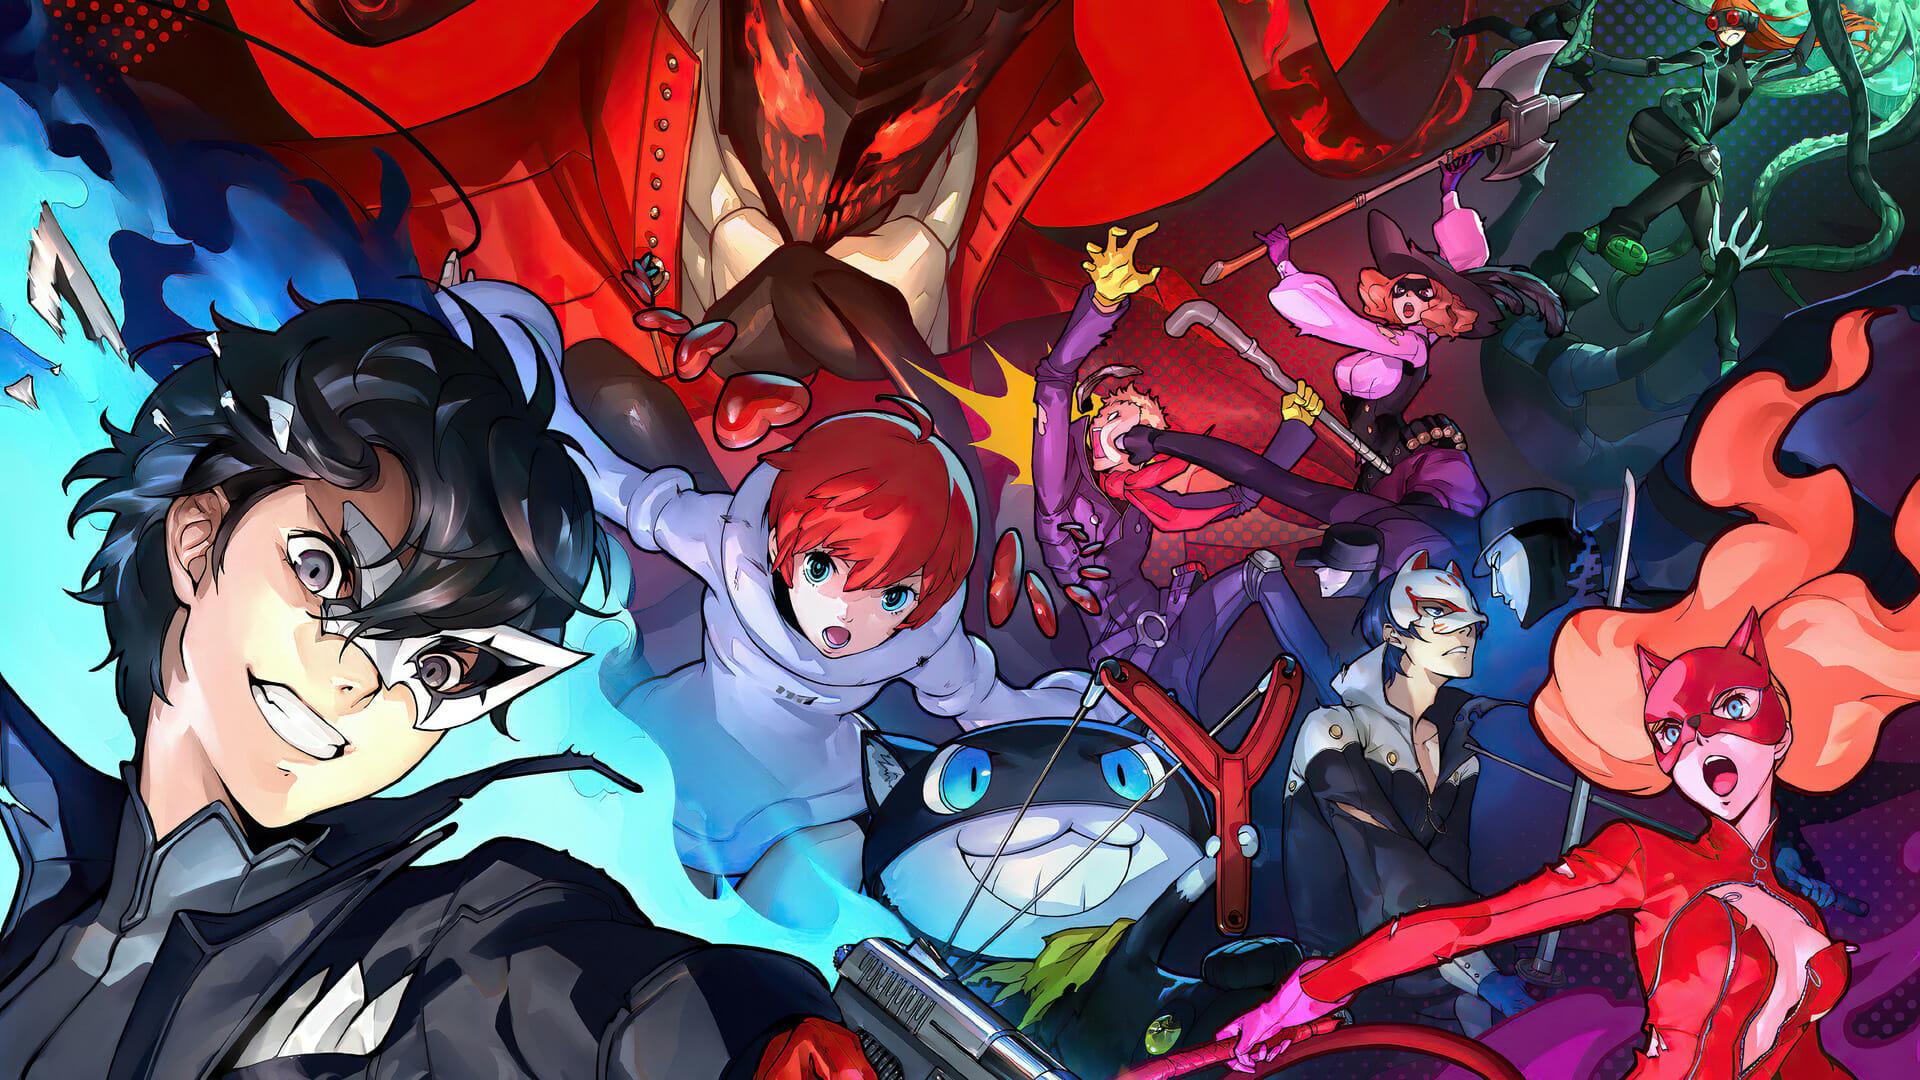 Persona 5 Strikers Pre-Order Bonus